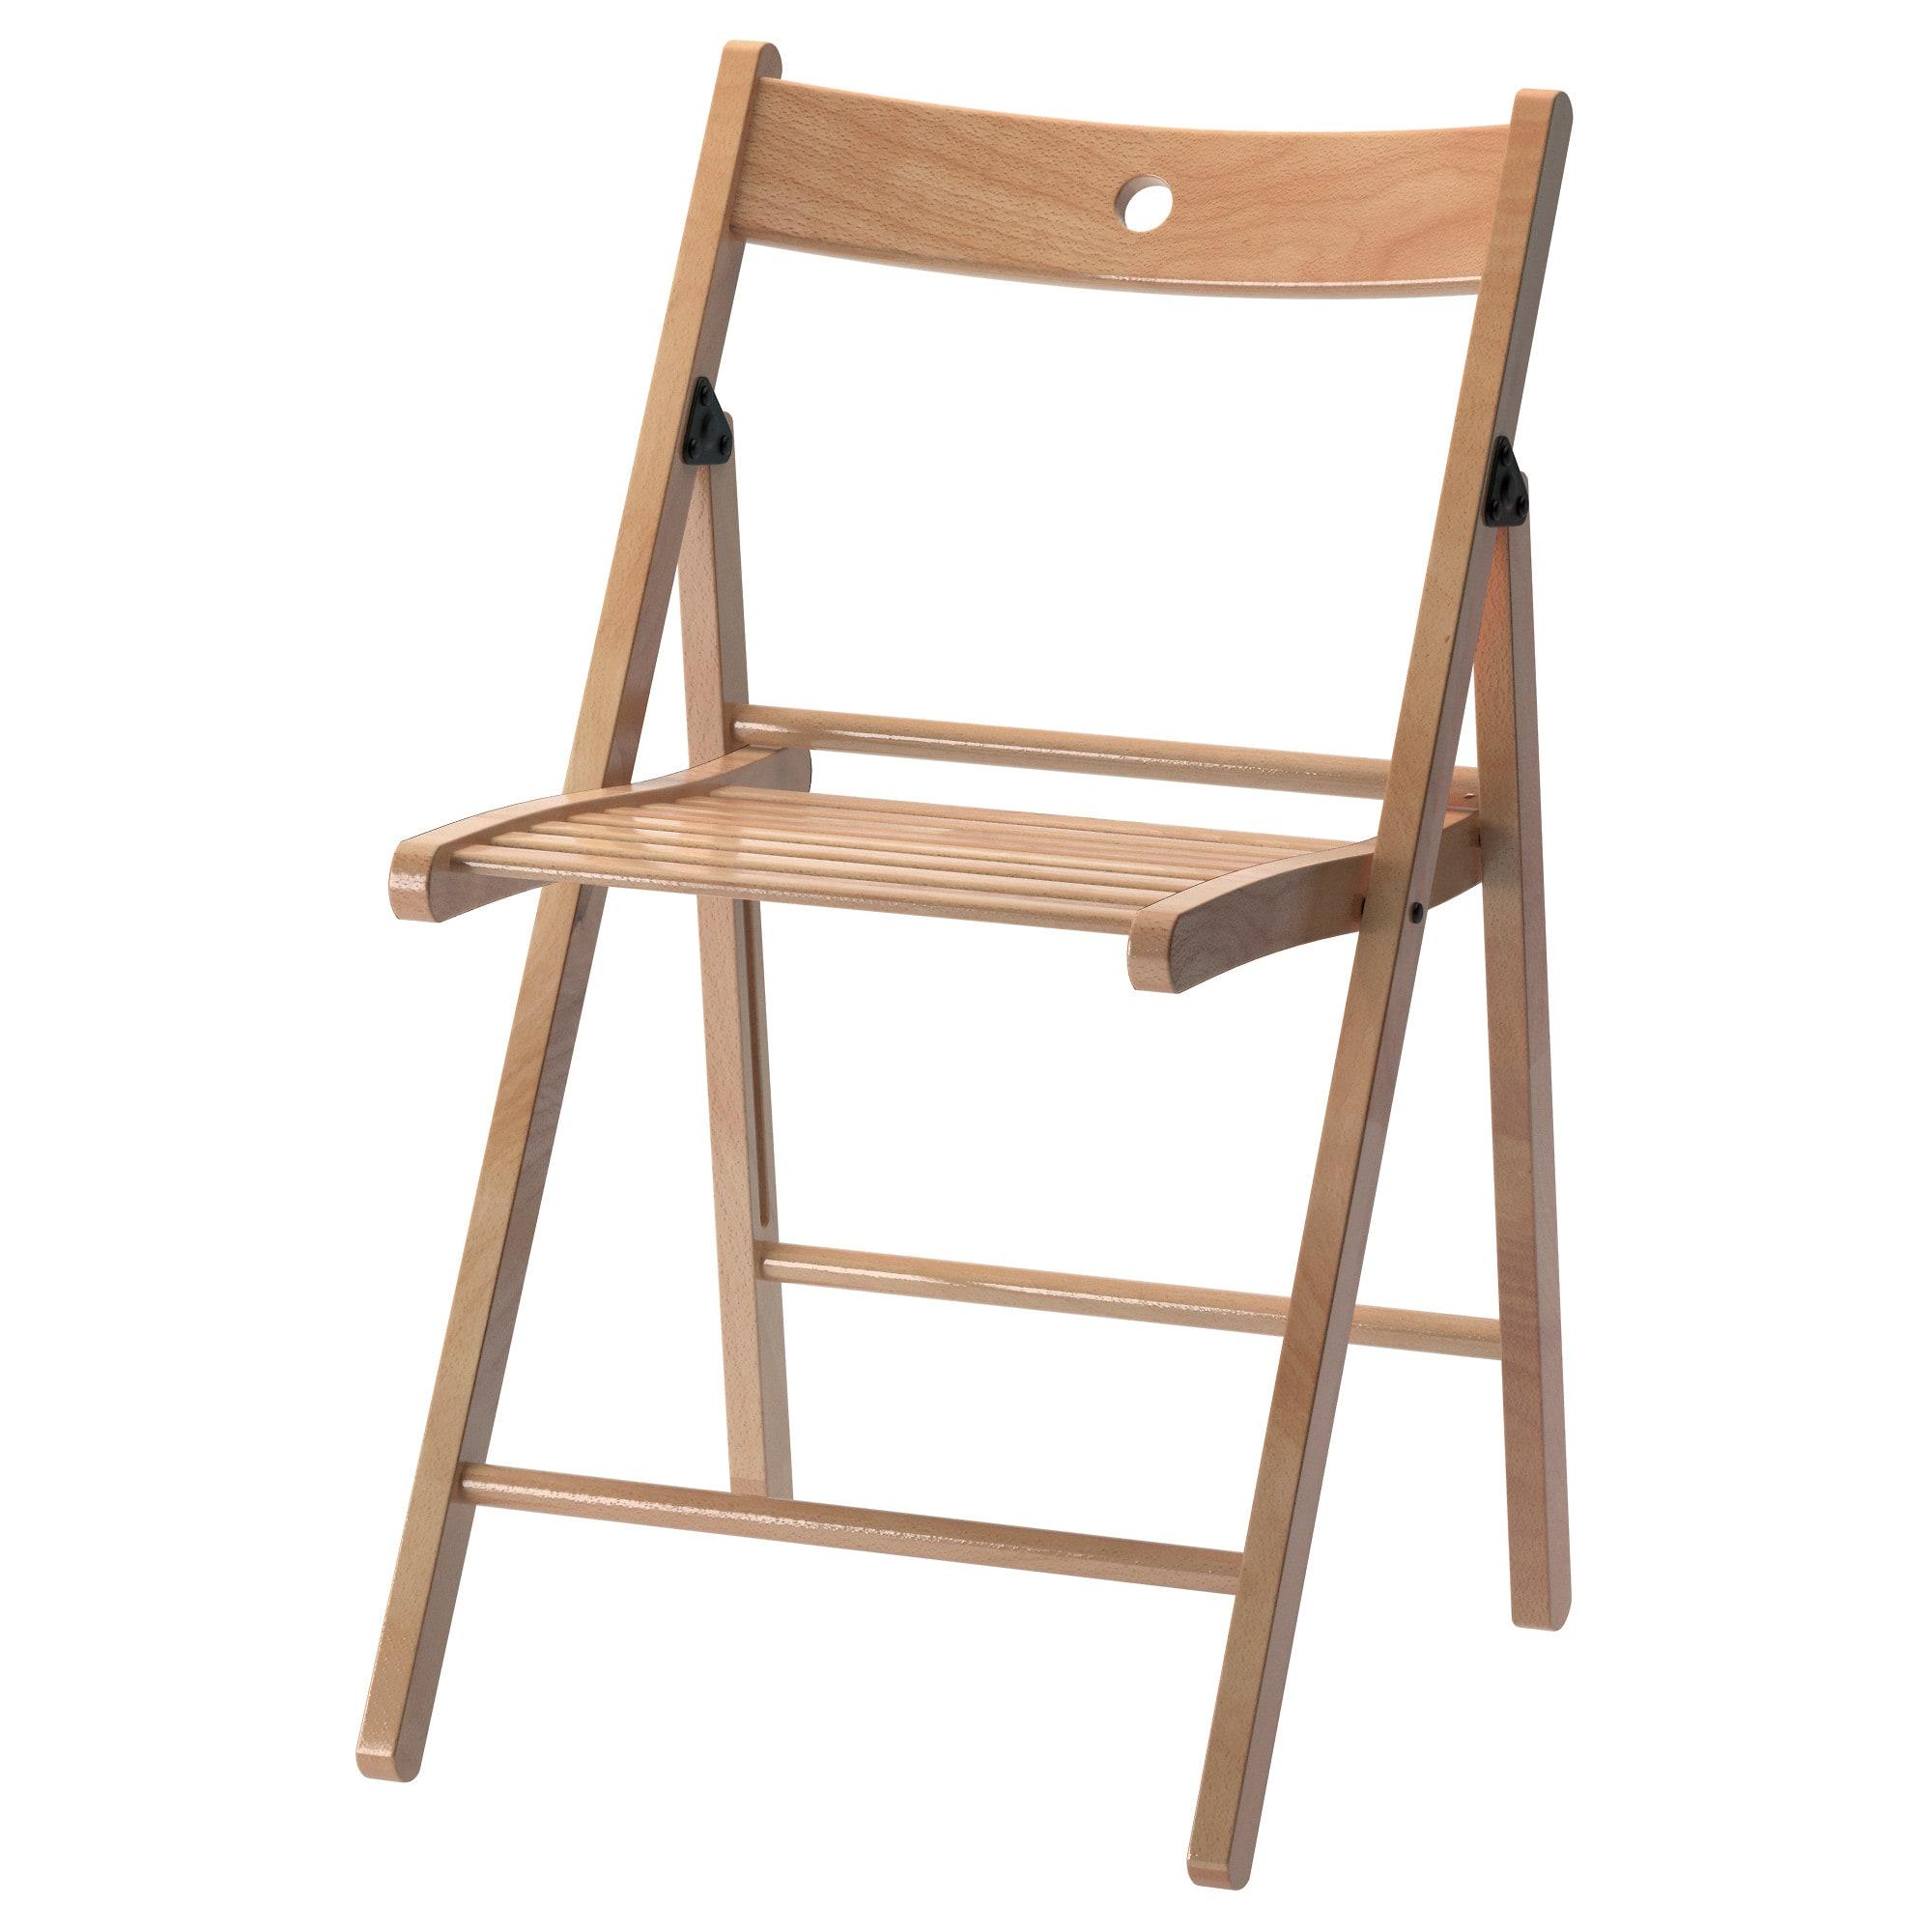 Sedie Pieghevoli Imbottite Ikea.Terje Sedia Pieghevole Faggio Esstisch Stuhle Stuhle